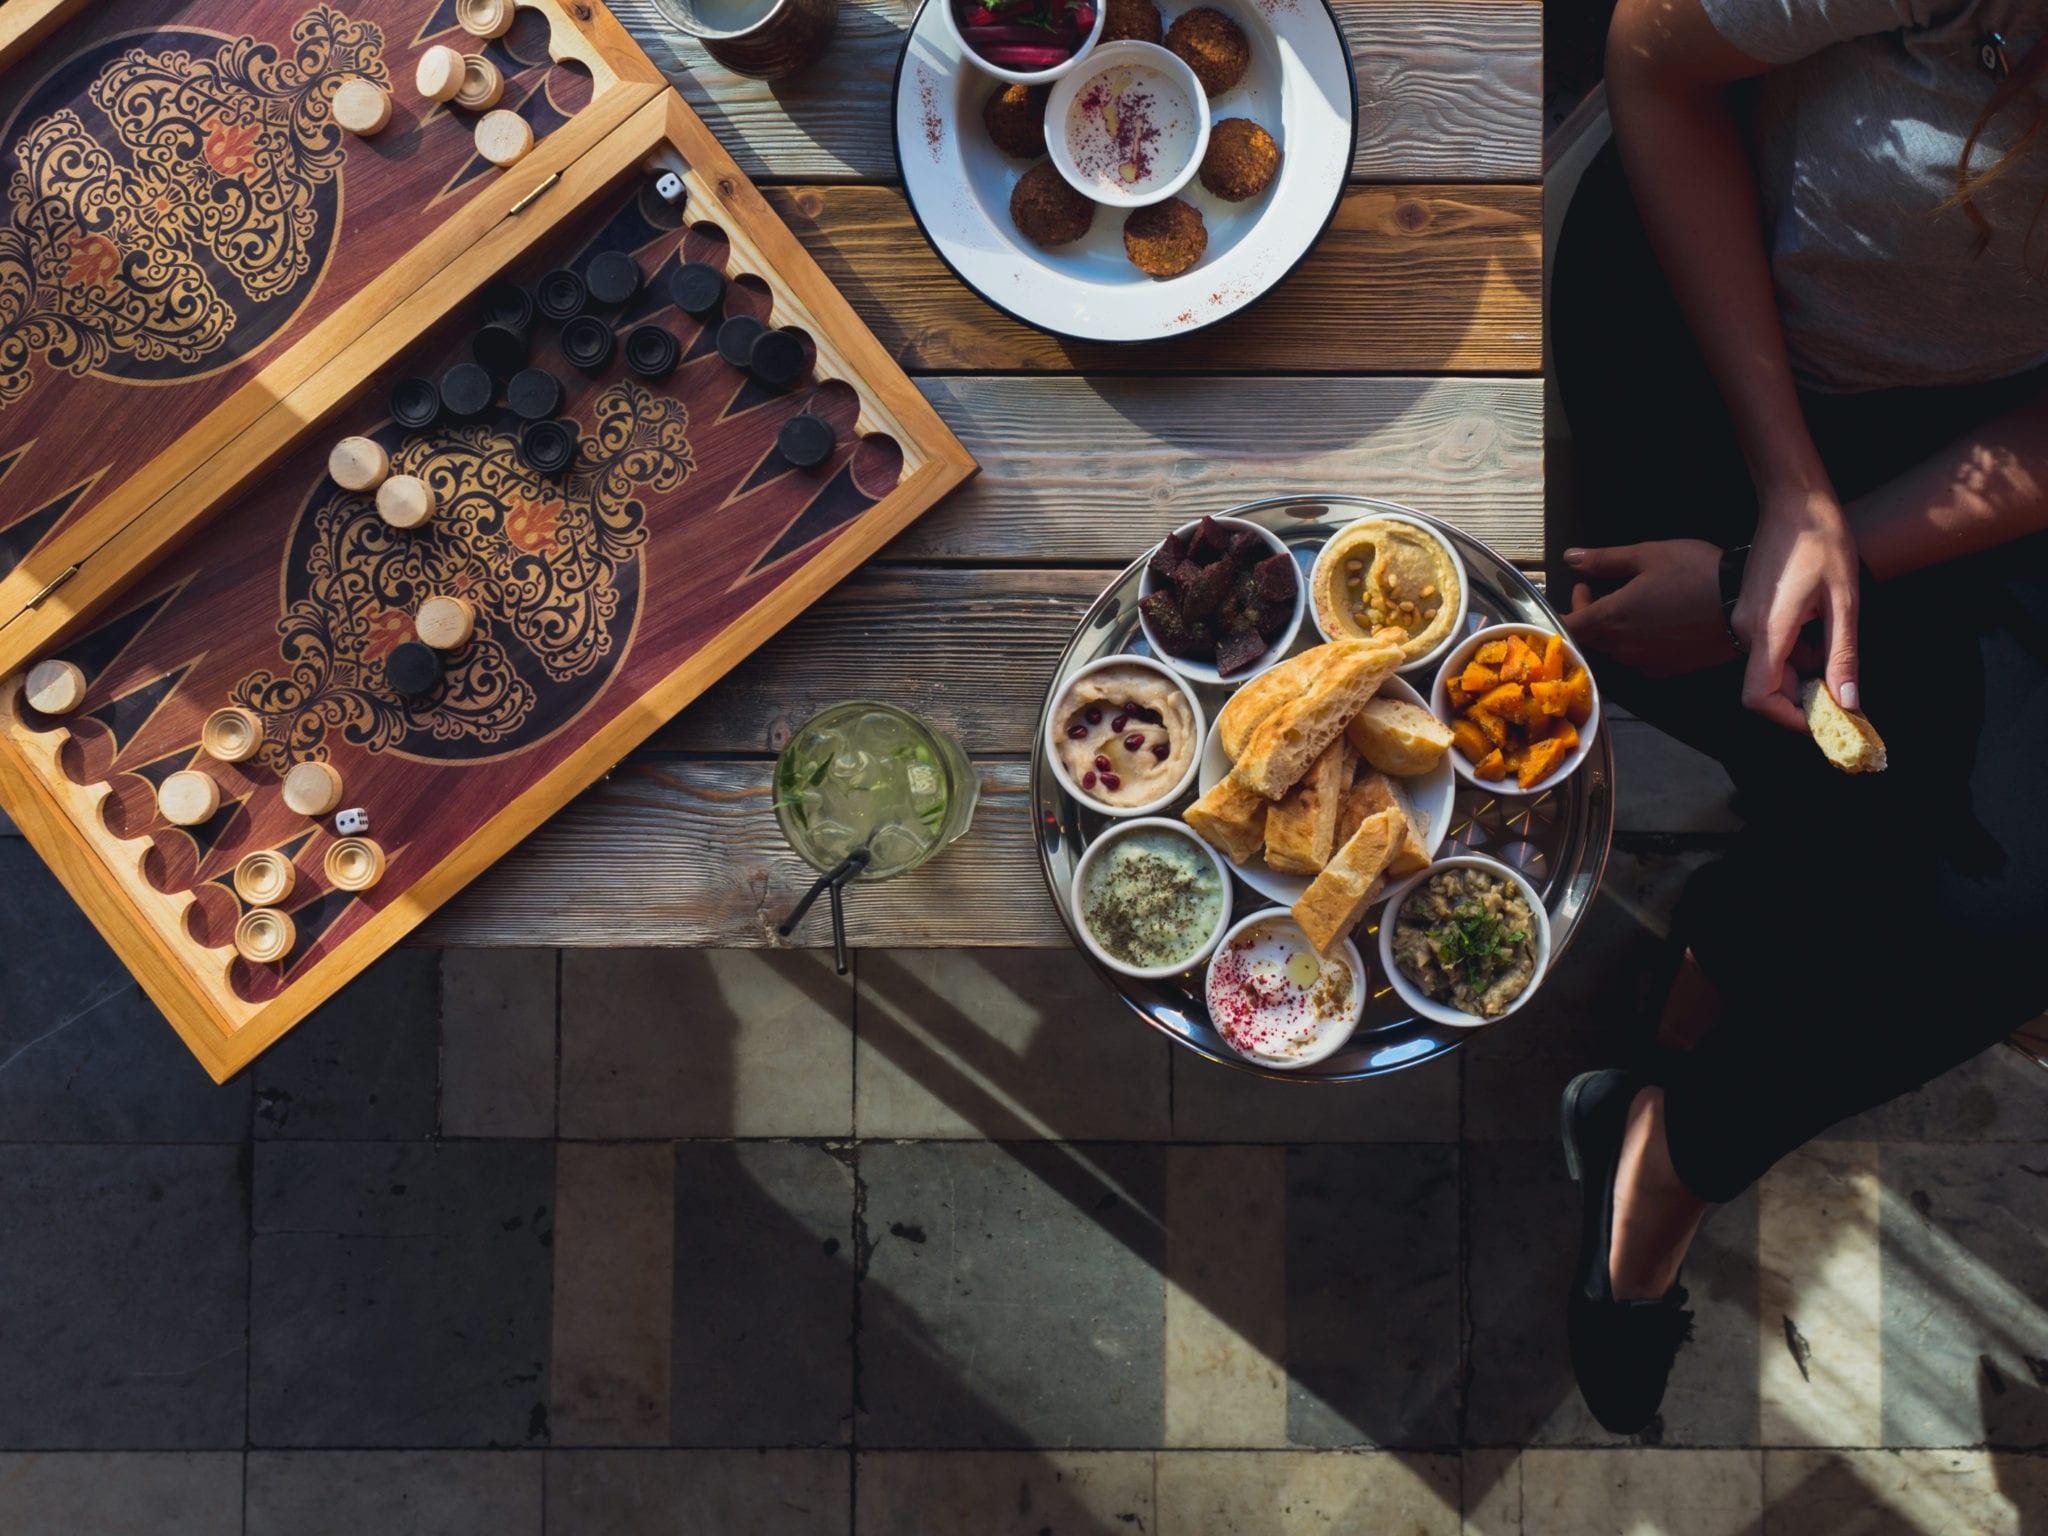 Traditional Lebanese fare at a Beirut cafe © | Frau Tori/Shutterstock